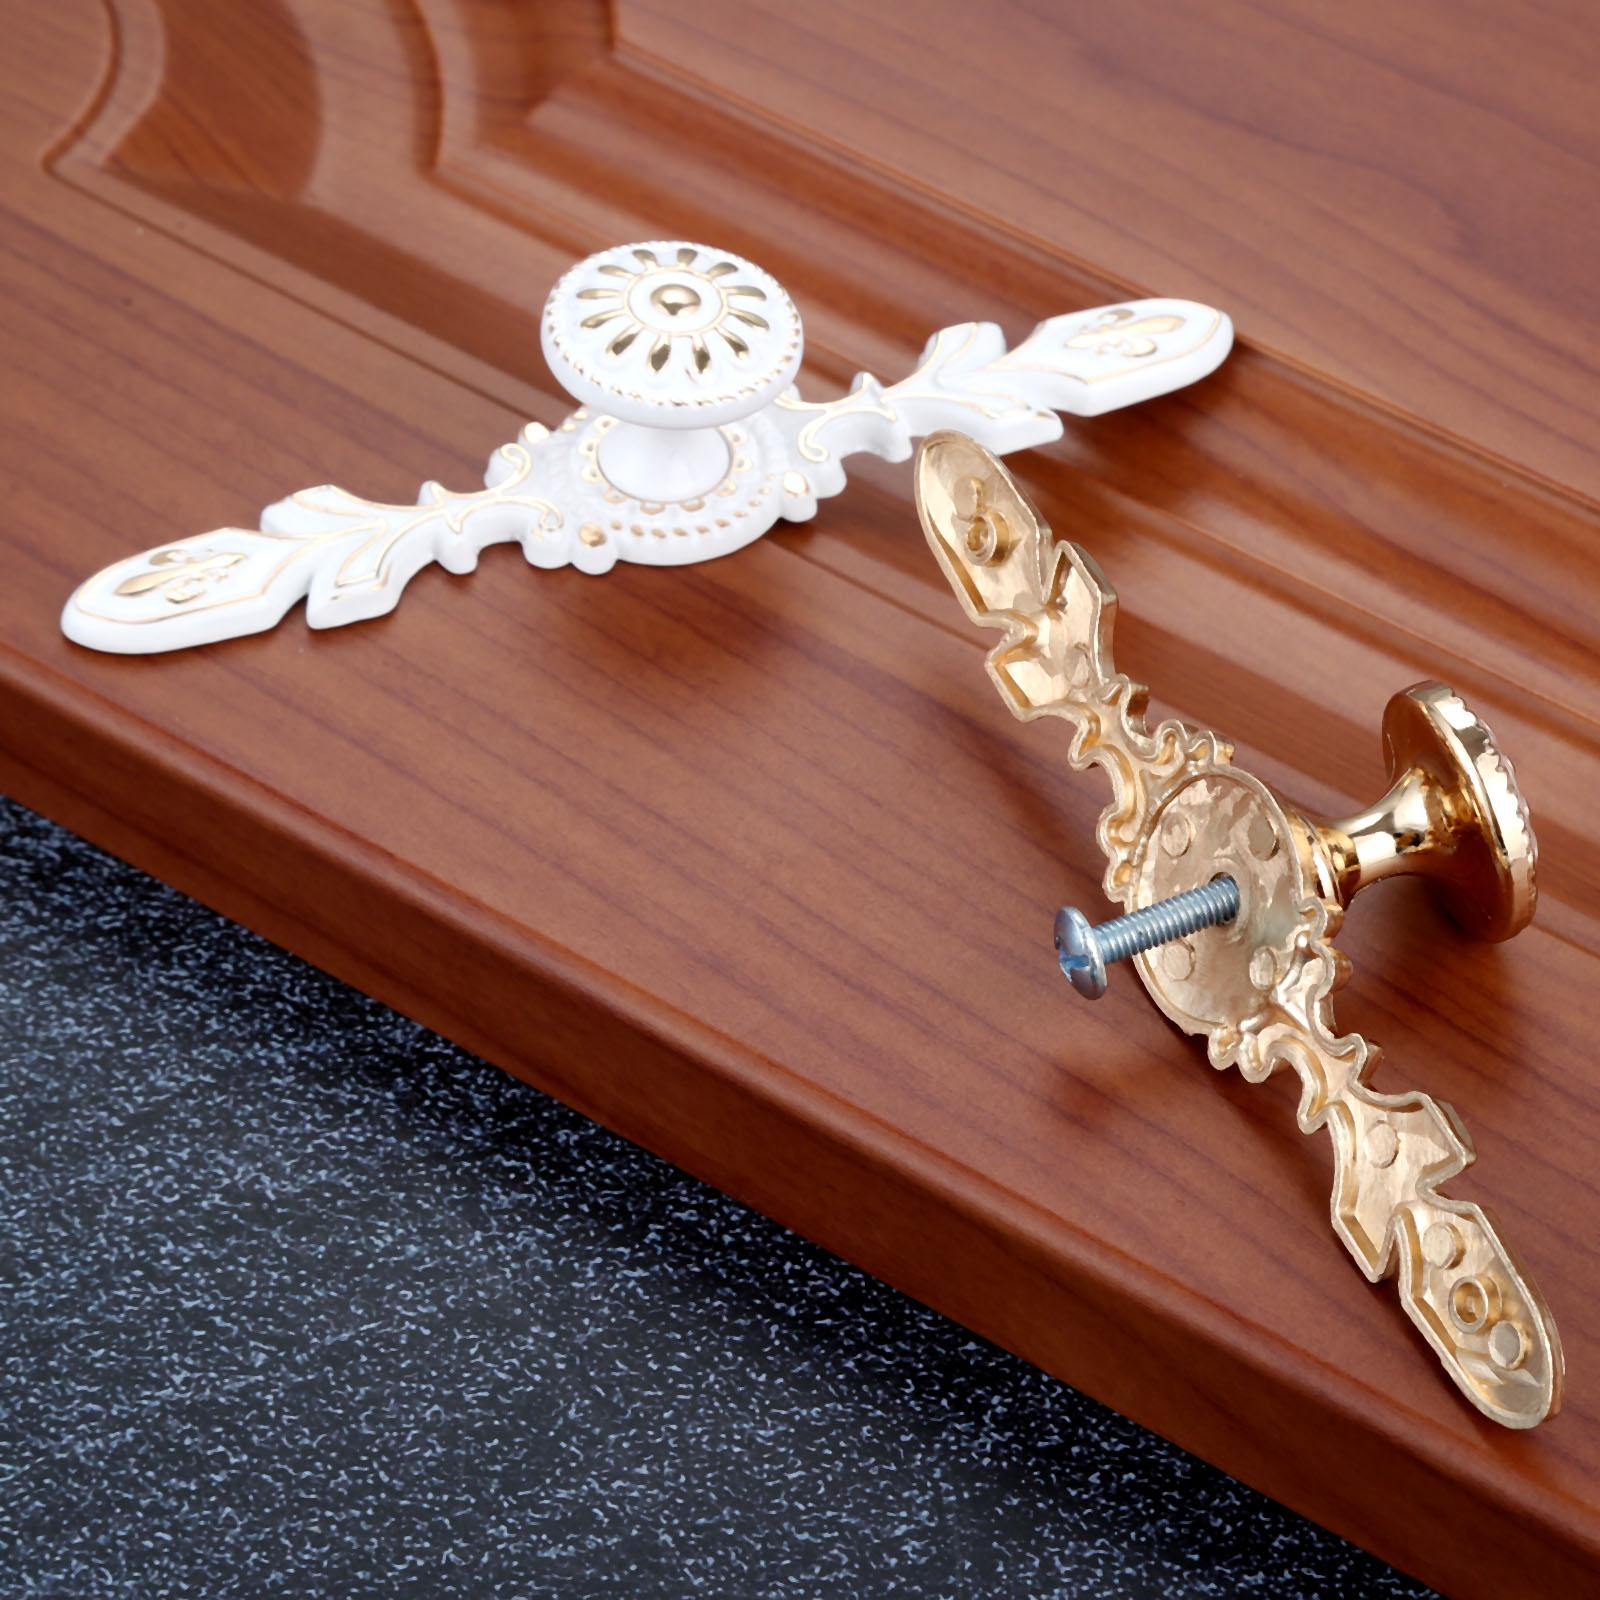 Cabinet Handles Kitchen Cupboard Door Pulls Zinc Aolly Drawer Knobs European Fashion Furniture Hardware Ivory White in Door Handles from Home Improvement